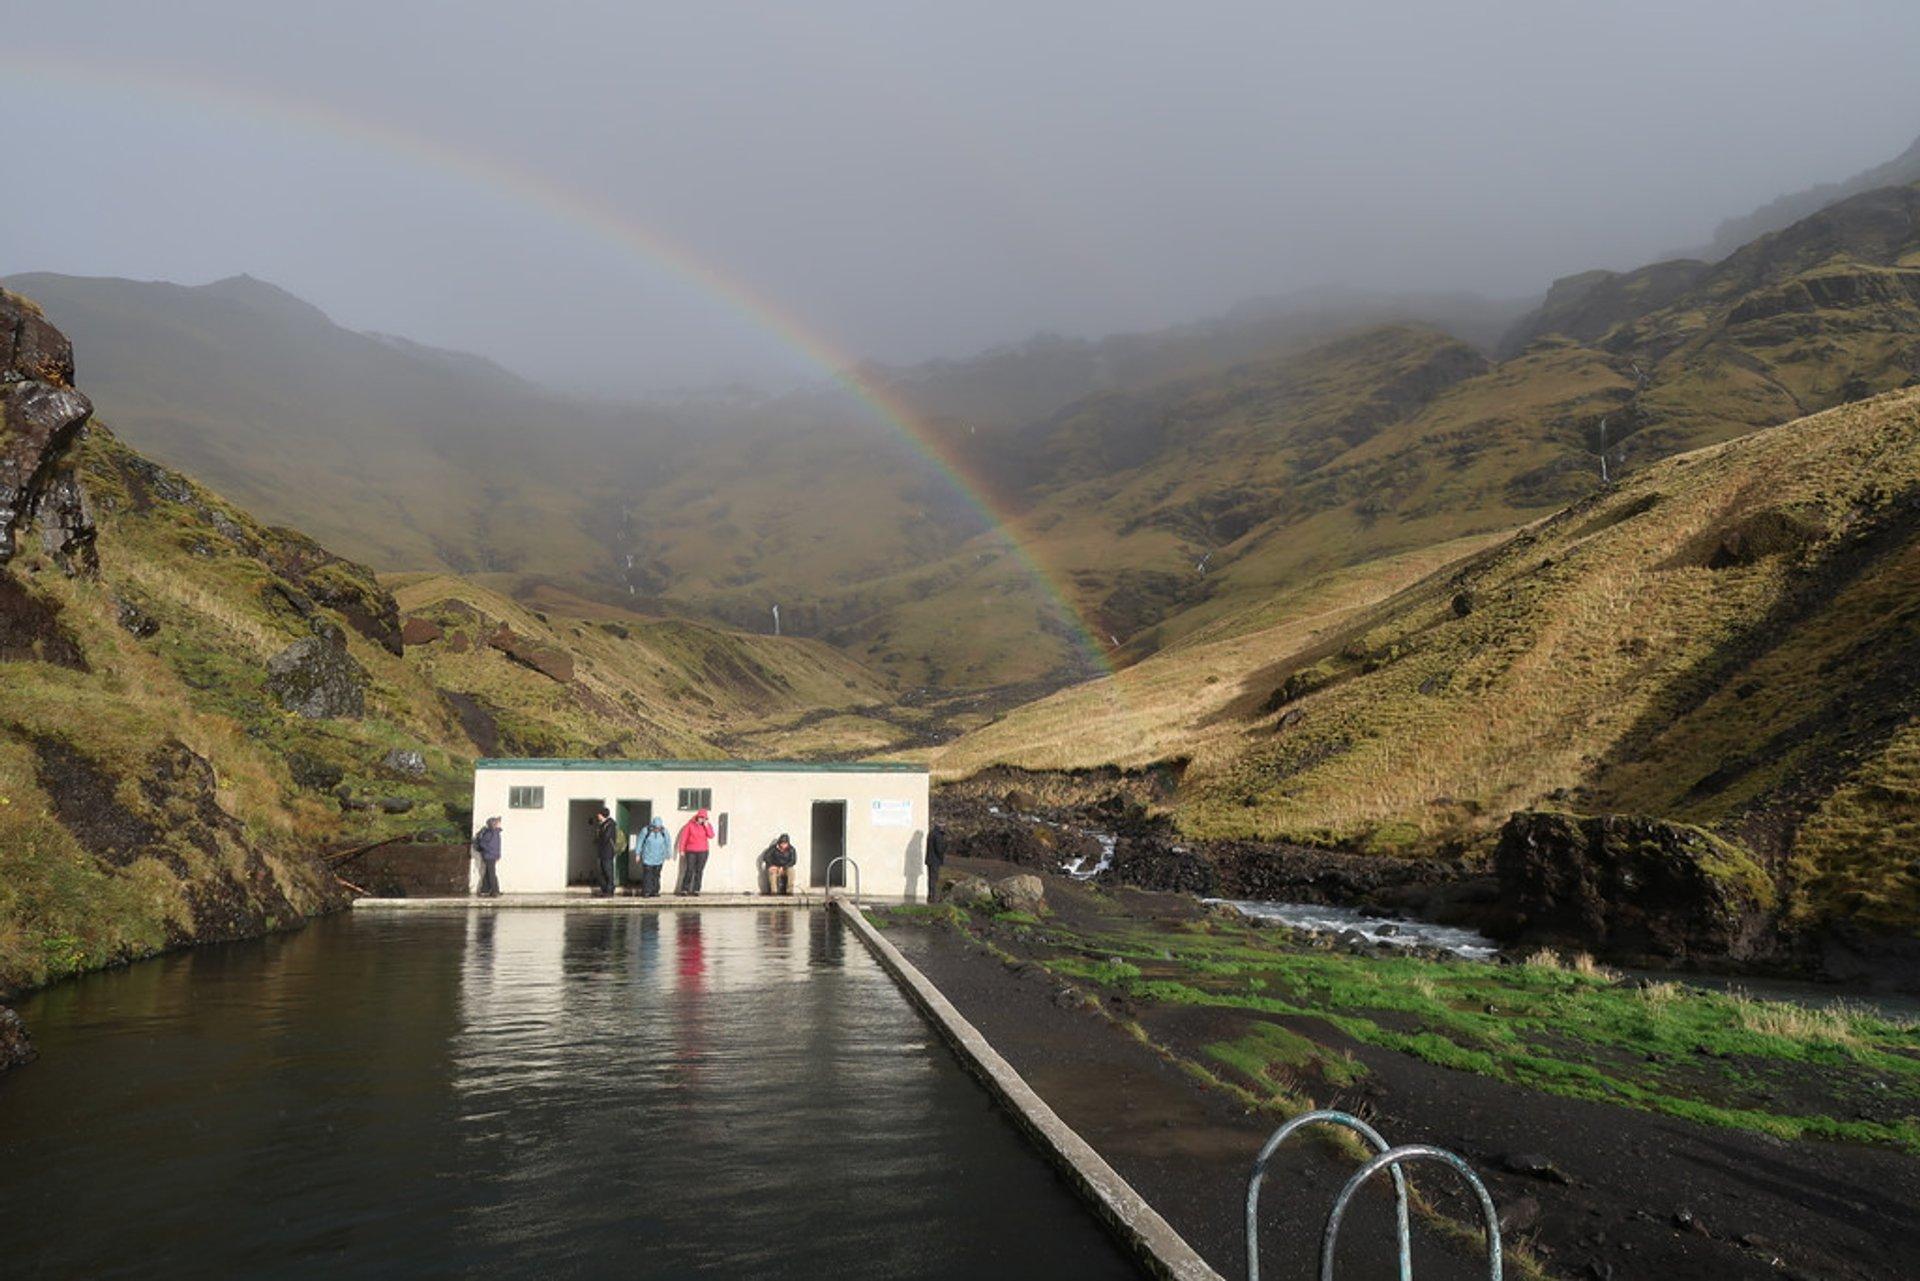 Seljavallalaug Swimming Pool in Iceland - Best Season 2019